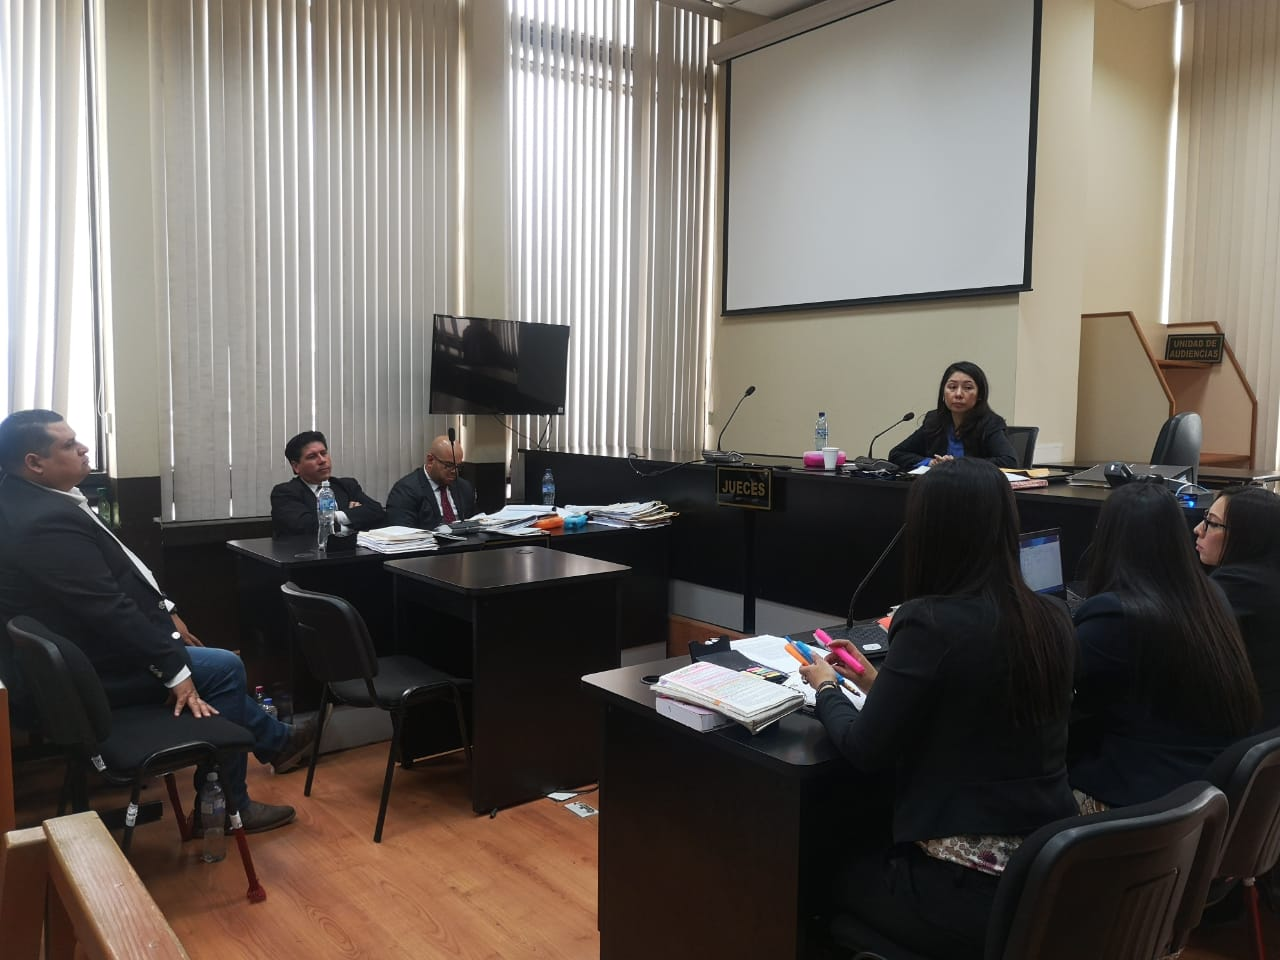 Ligan a proceso a exdiputados por caso Asalto al Ministerio de Salud